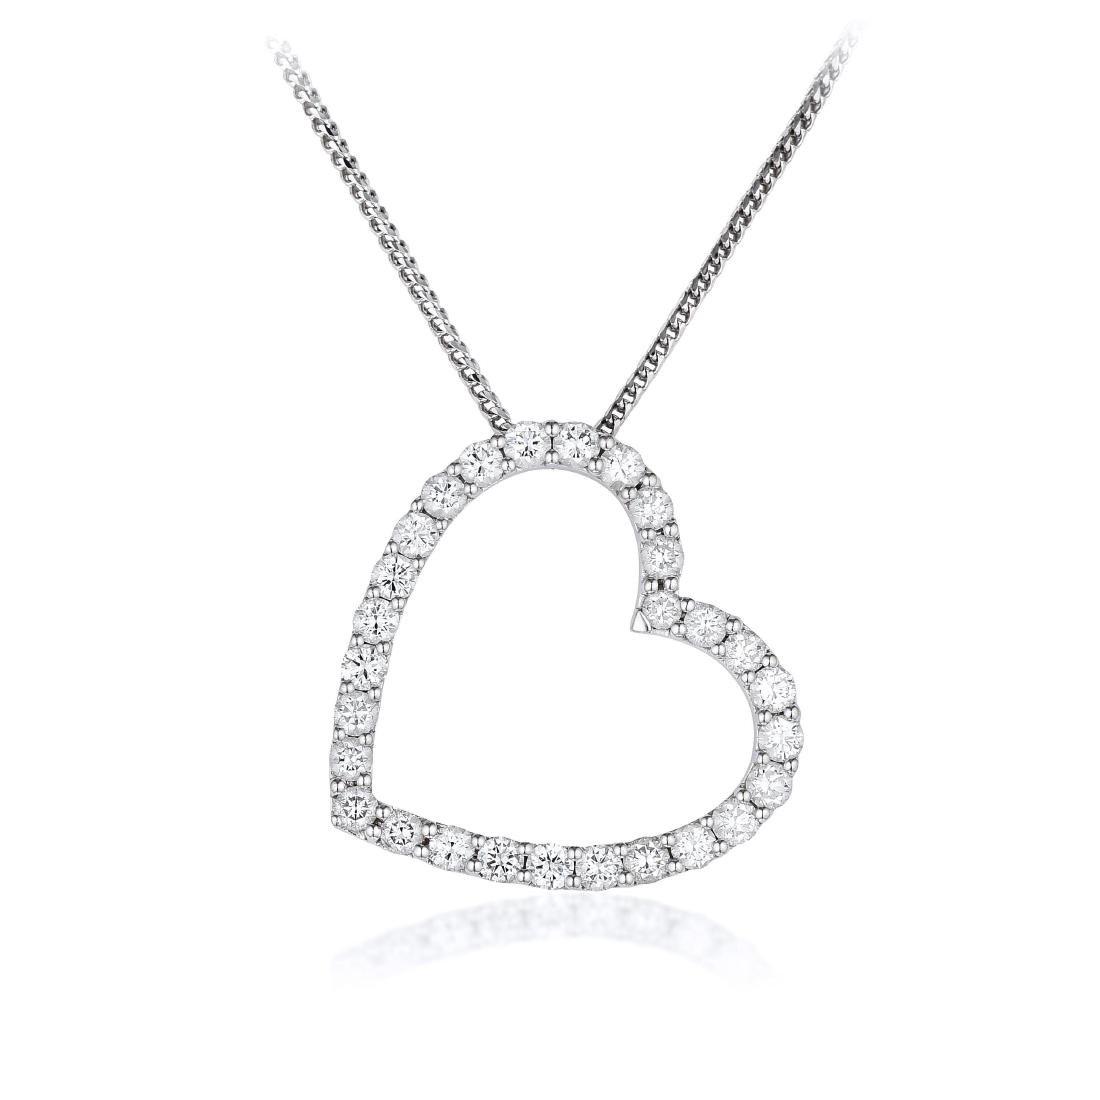 An 18K Gold Diamond Heart Pendant Necklace